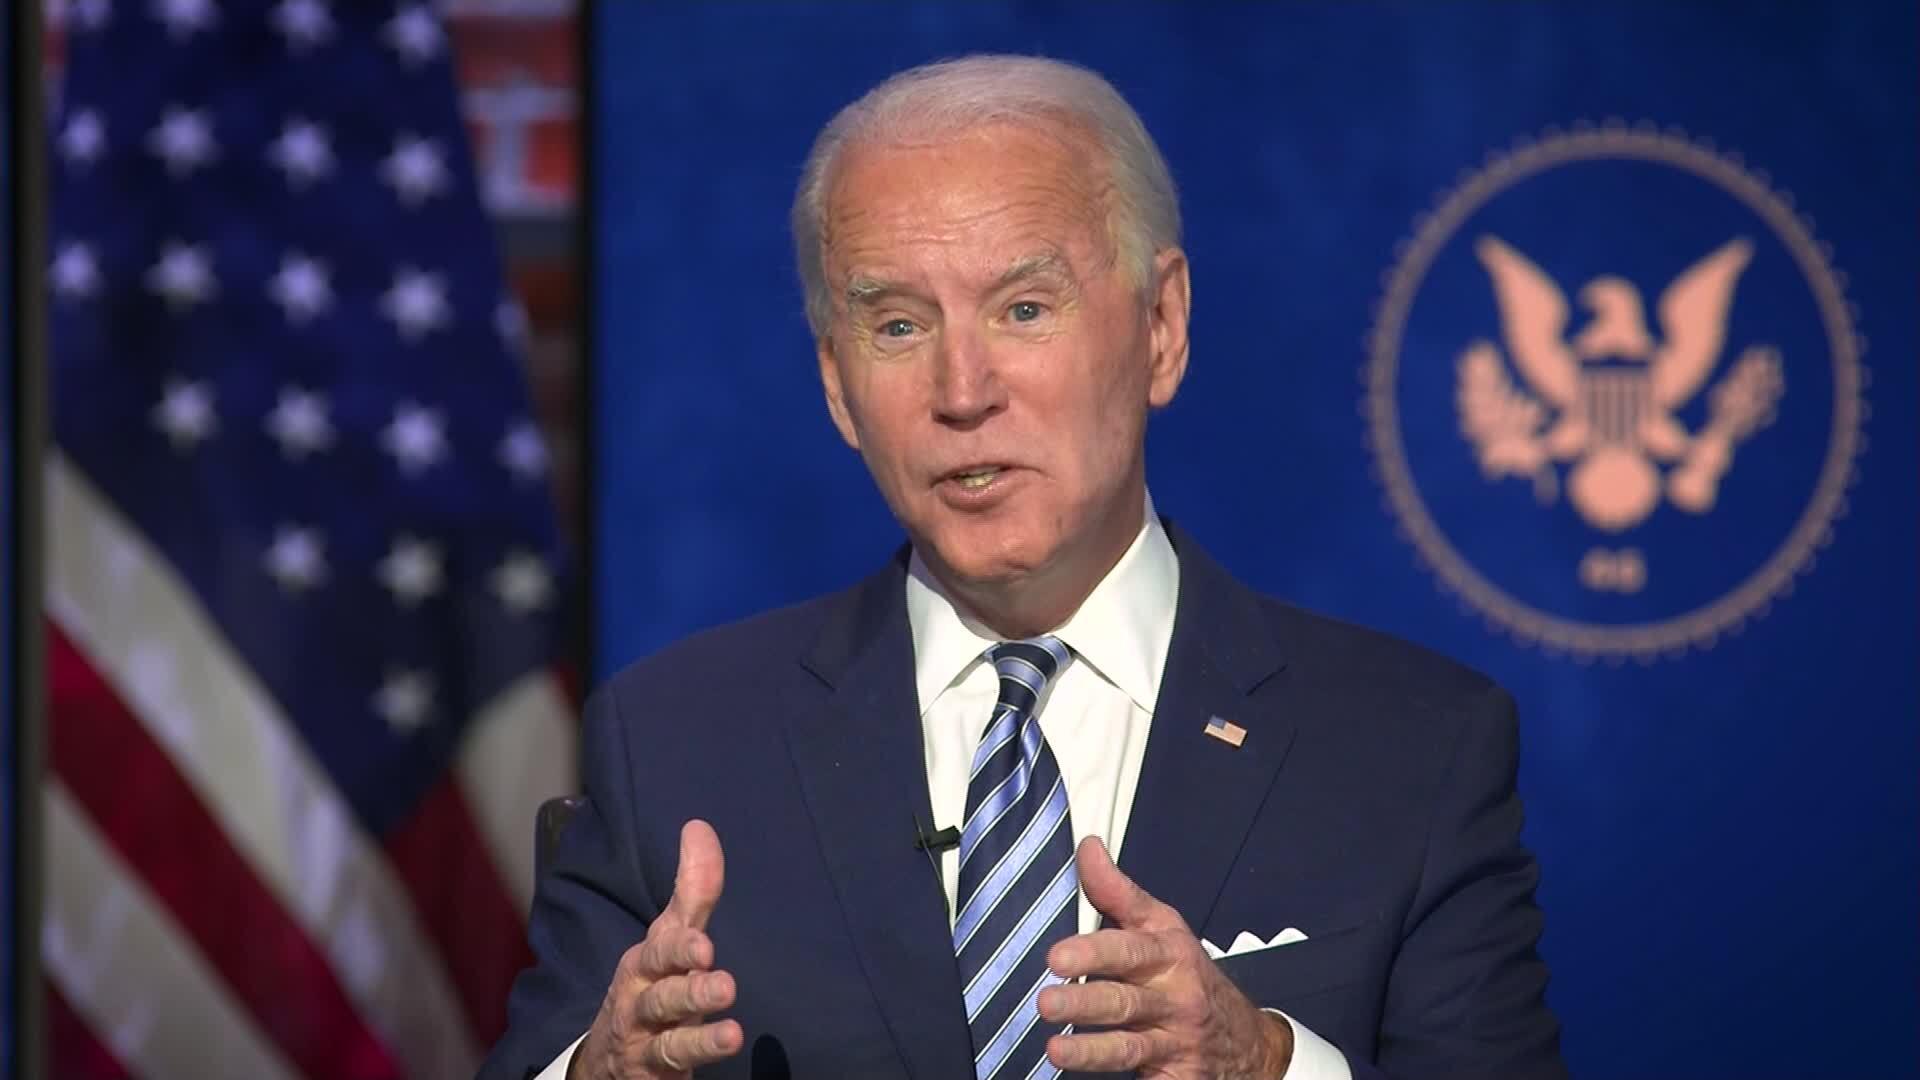 President-elect Joe Biden speaks during an interview with CNN's Jake Tapper on December 3.